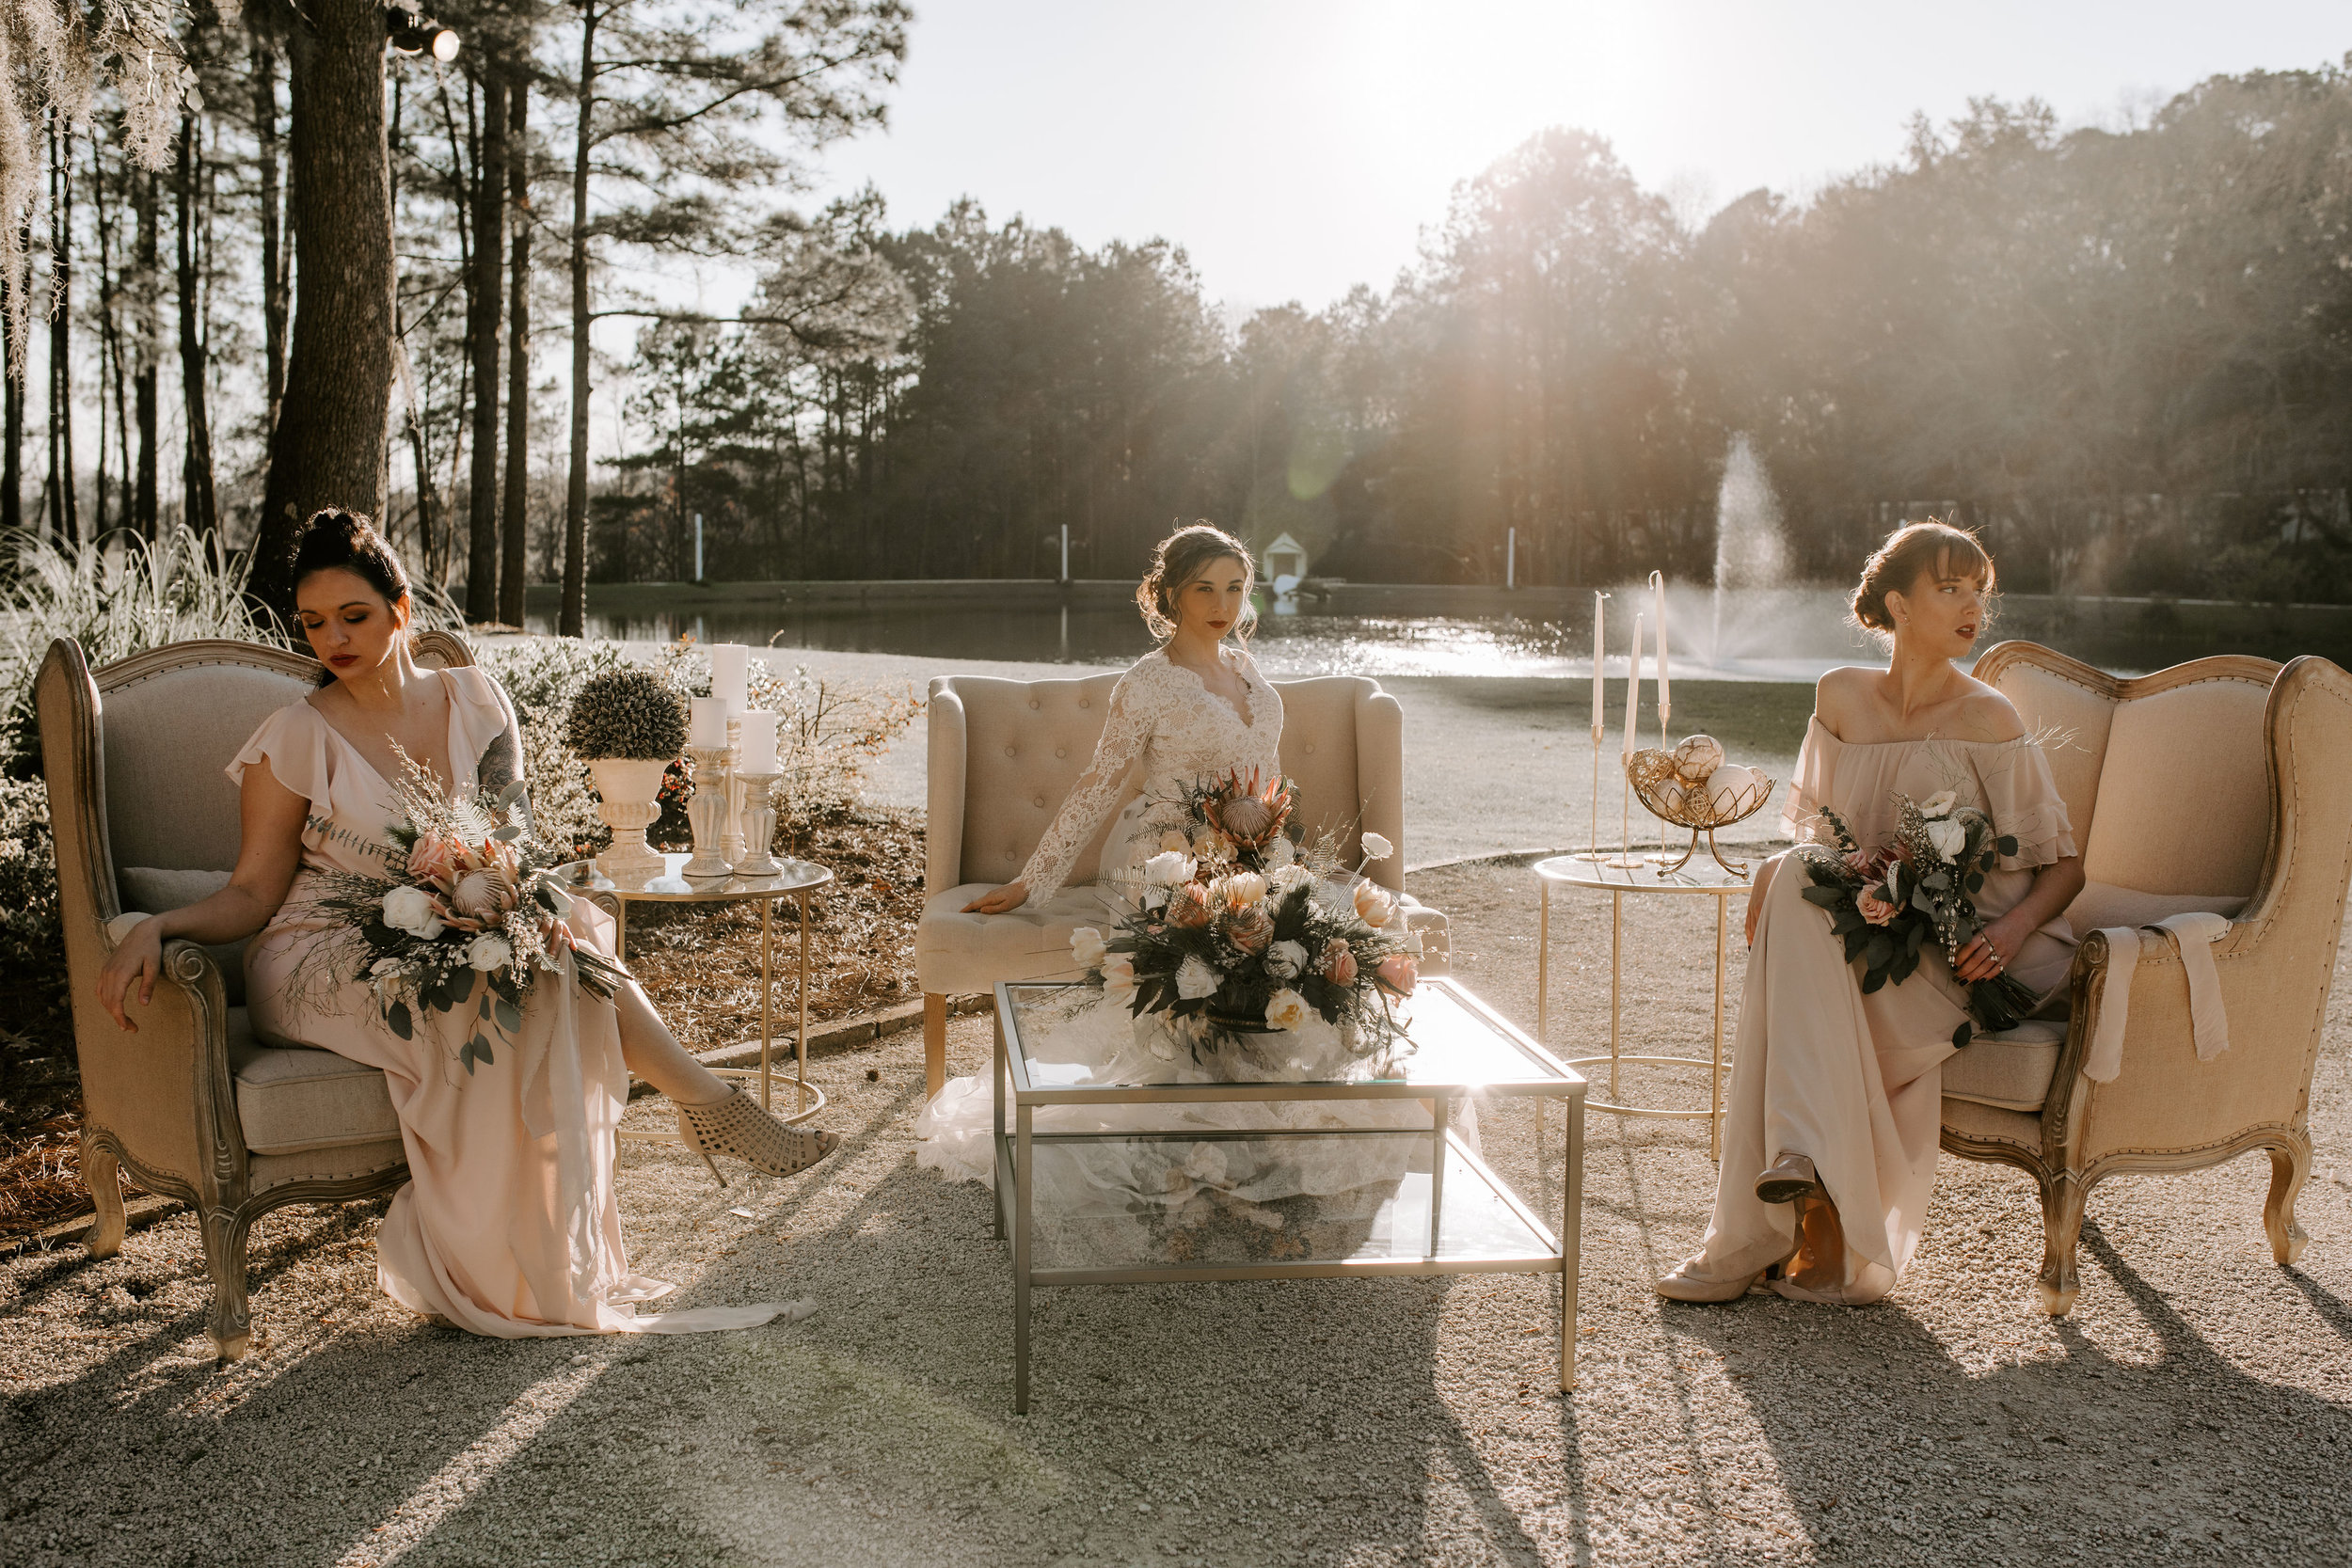 ivory-and-beau-blog-mackey-house-styled-shoot-savannah-wedding-bridal-boutique-savannah-florist-southern-wedding-_G5A2625.jpg